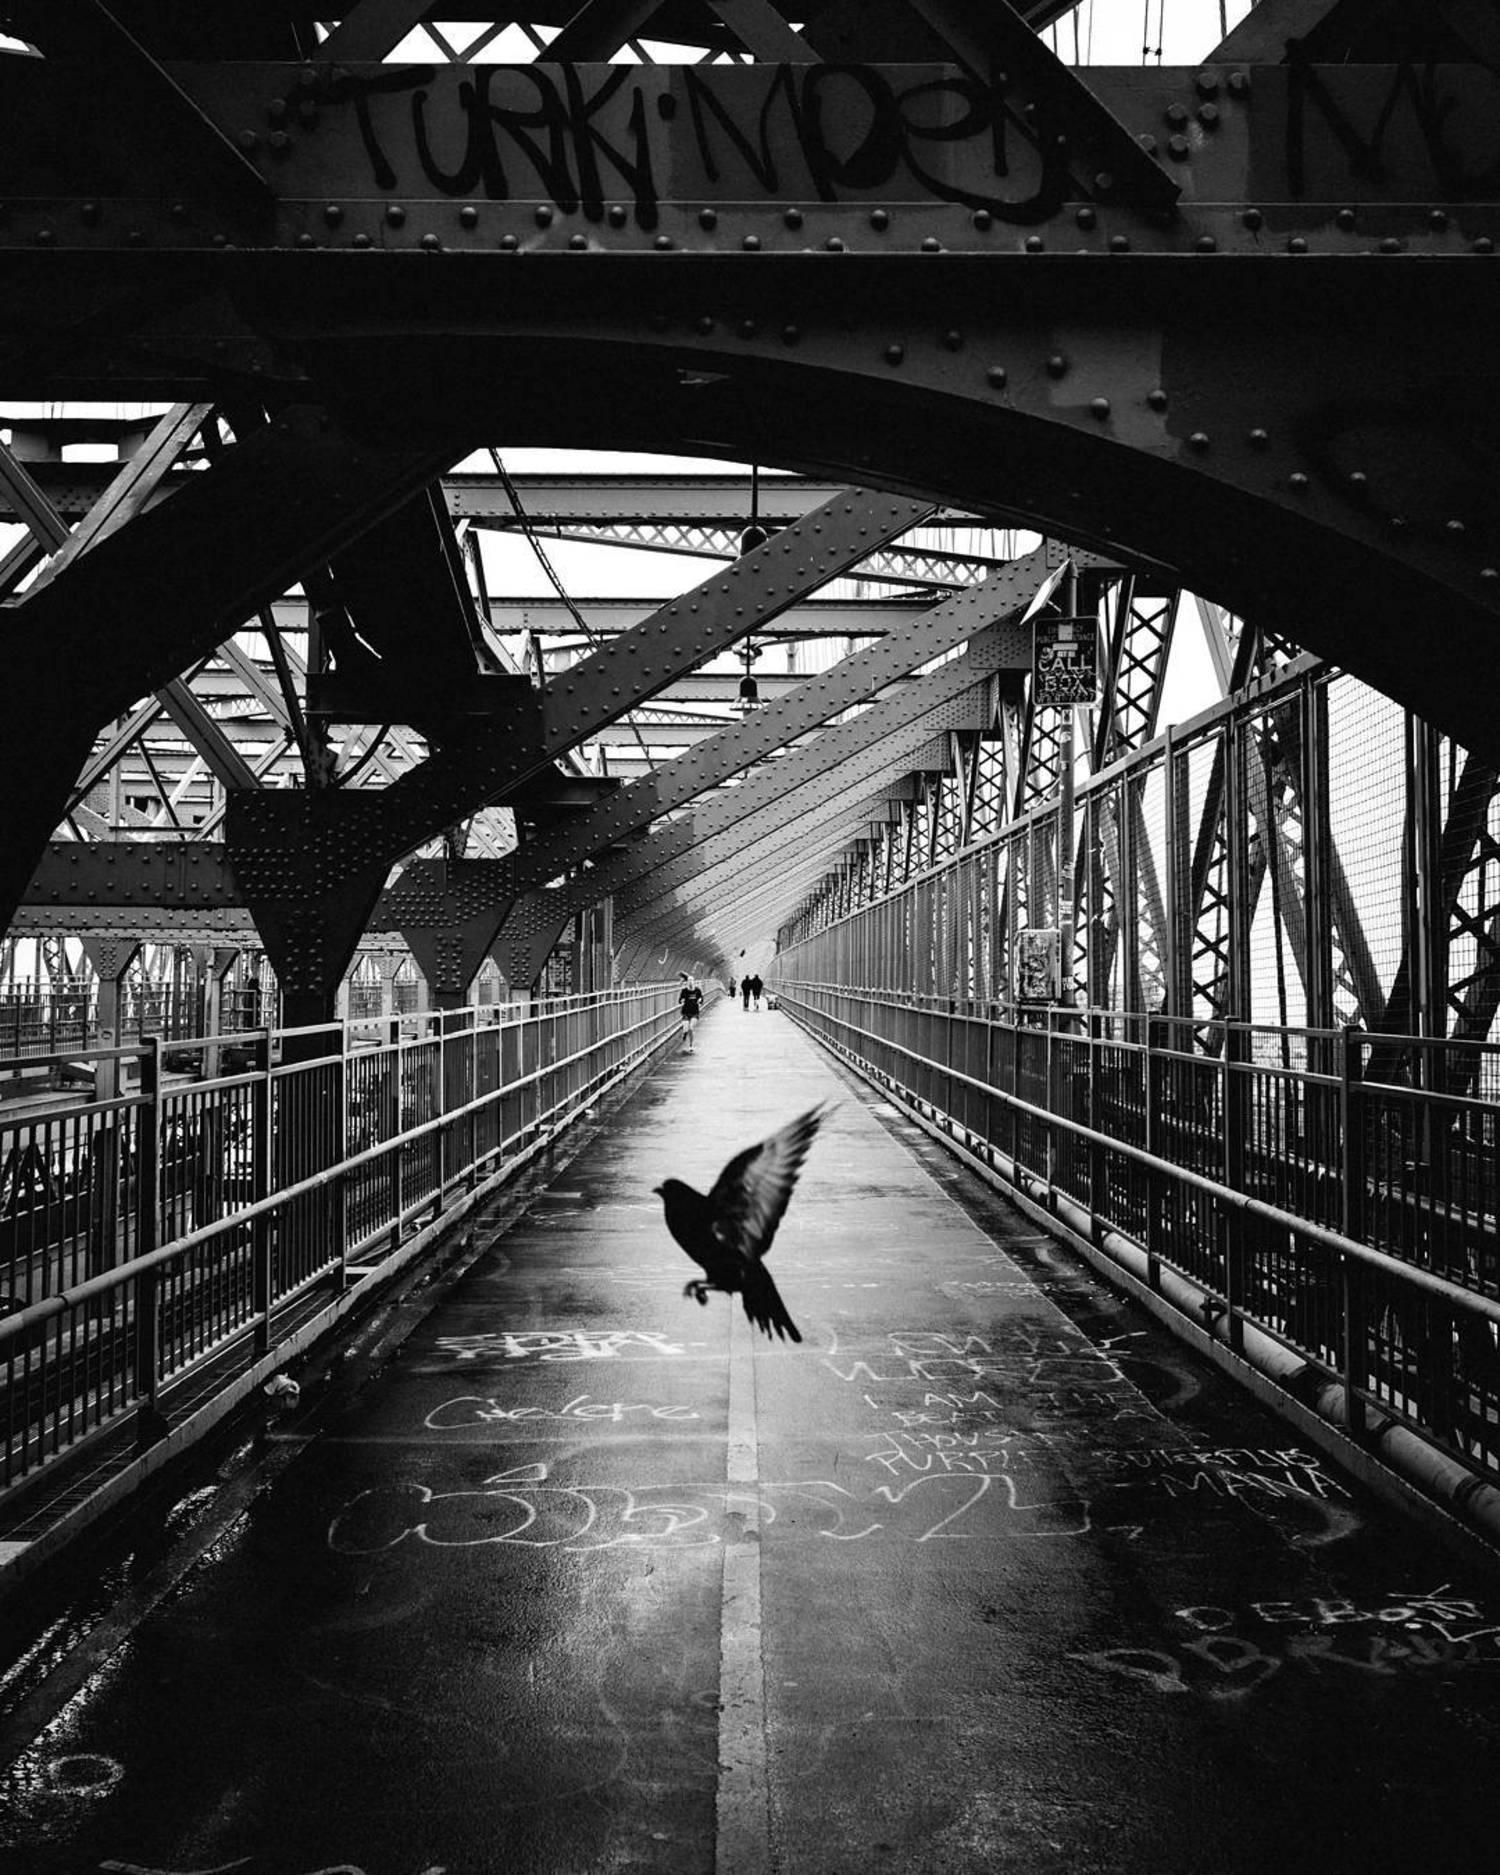 - Devine Intervention🕊️- #ILLest173  #blackandwhiteisworththefight #bnwwtf #nycp  #life_is_street #streetlife_award #streetleaks #suspectmag #streetcollectors #sber6 #Citykillerz  #streetmagazine #streetdreamsmag #nyc #symmetry #newyorkcity #streetphotography #street  #moodygrams #bnw_sundays #bnw_captures #lightroommasters #symmetrykillers #fox_bnw #estheticlabel #what_i_saw_in_nyc #canonusa #symmetricalmonsters #flockwithus #🐦